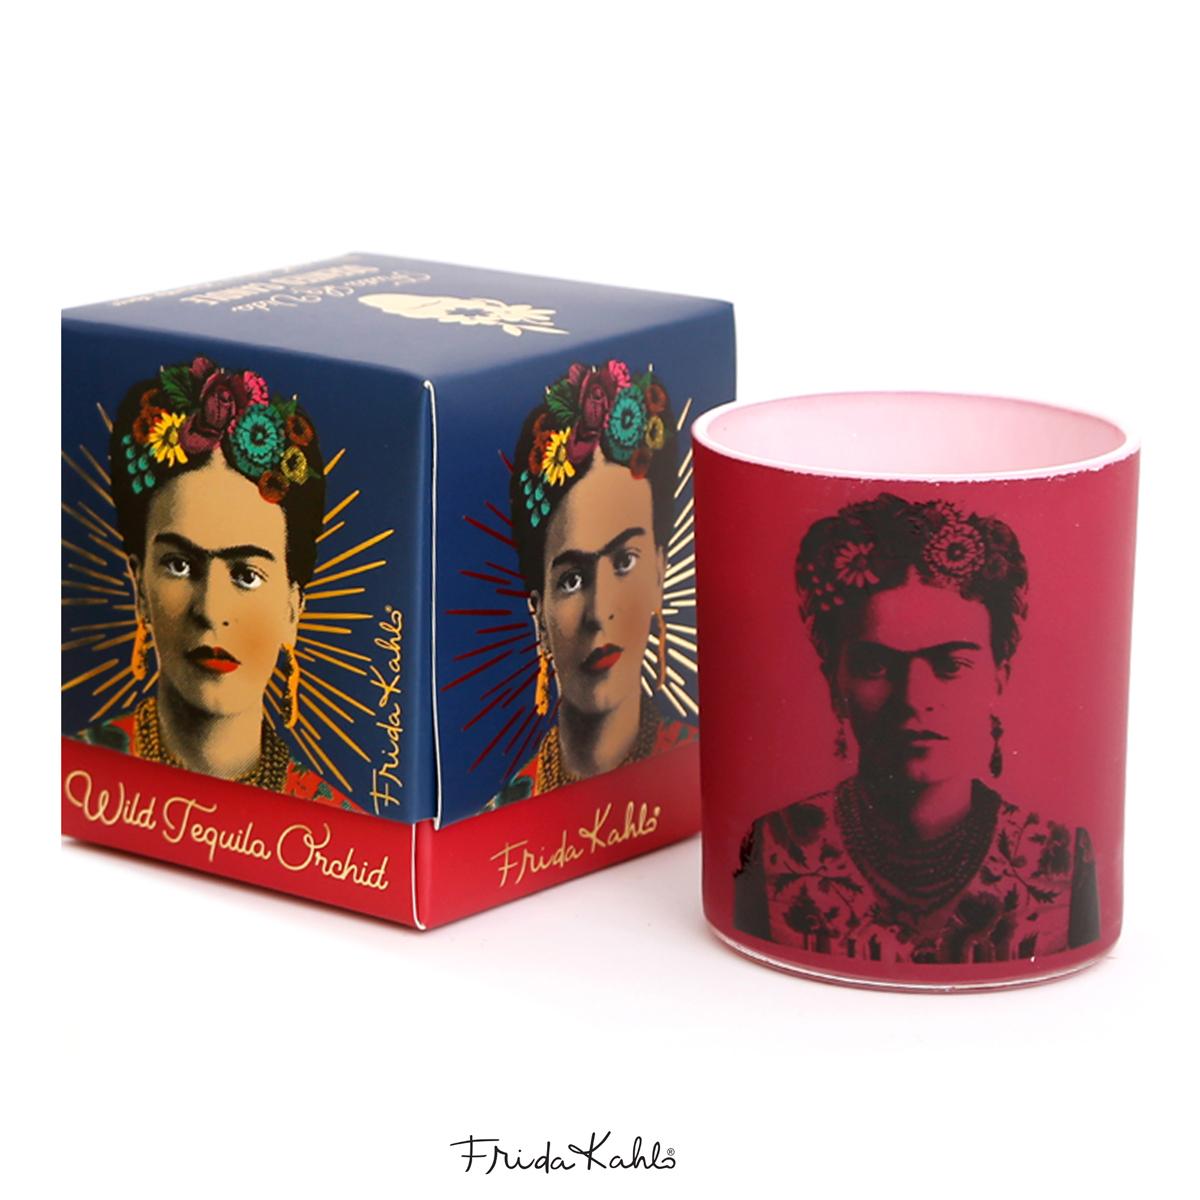 Bougie parfumée \'Frida Kahlo\' rouge (wild tequila orchid) - 8x7 cm - [A0612]